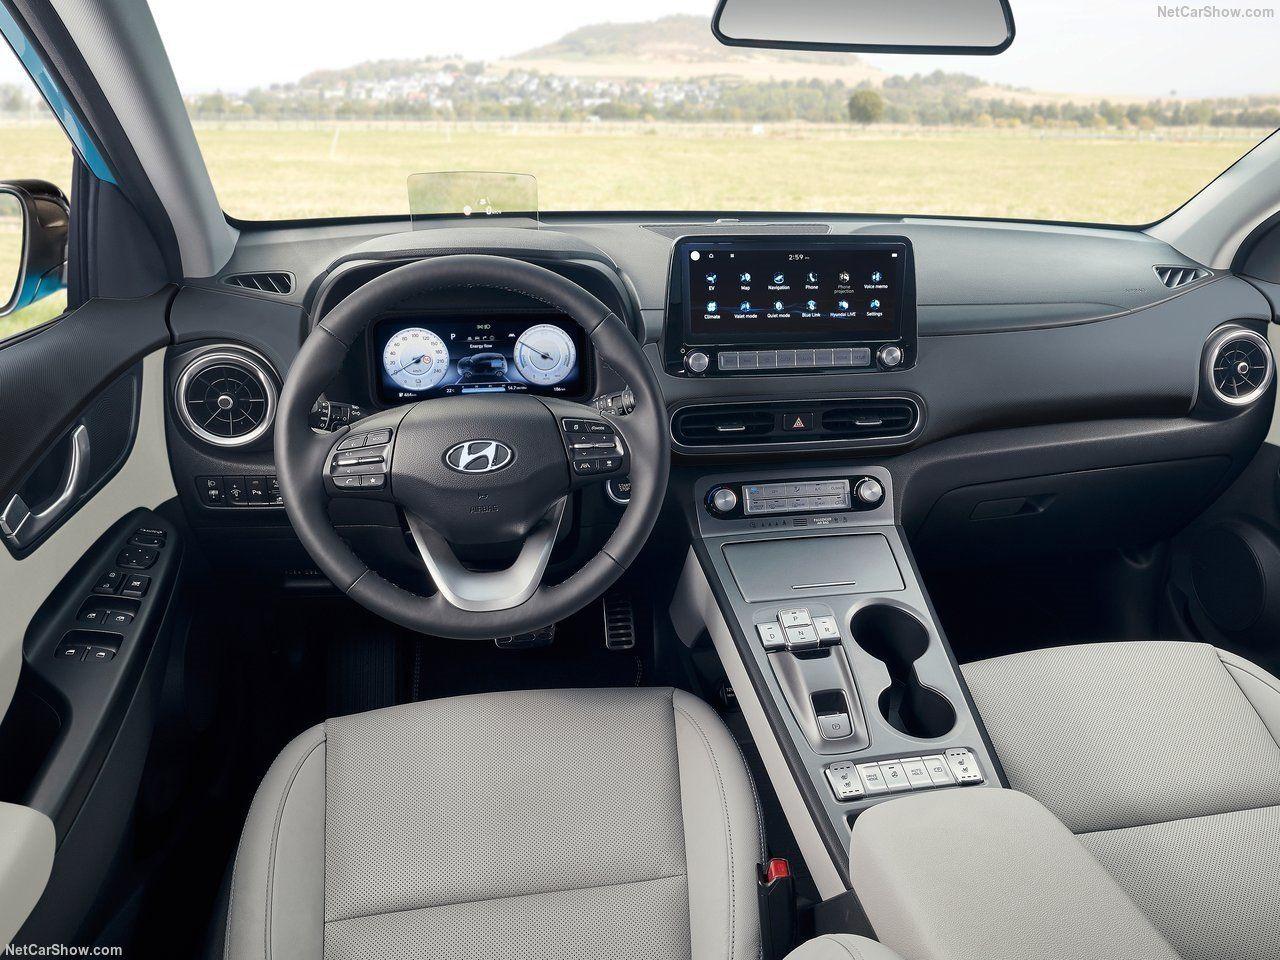 Hyundai'nin yeni elektrikli SUV'u Türkiye'de... İşte 2021 Hyundai Kona Electric - Resim: 4